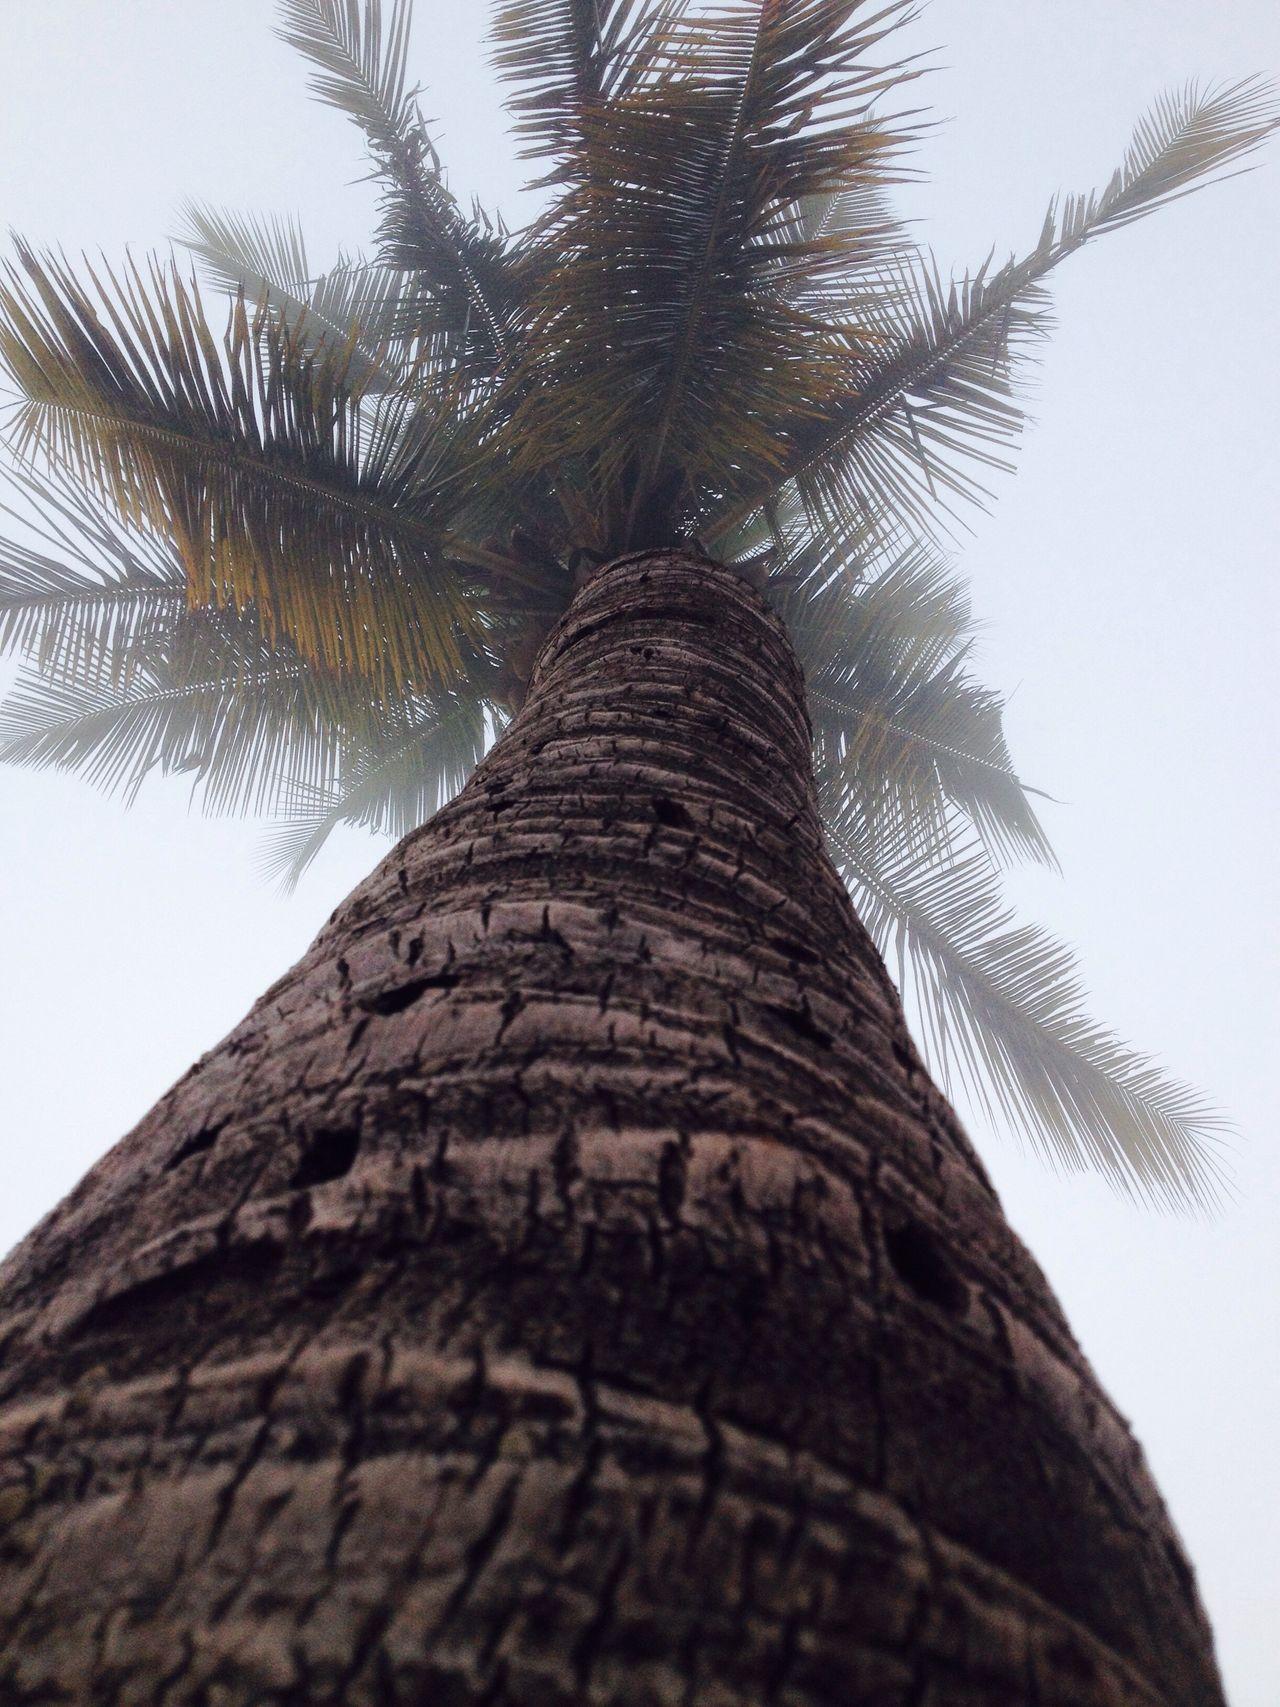 IPhone 4S IPhone4s IPhoneography Iphoneonly IPhone Iphonephotography Iphonesia Mobilephotography Mobile Photography Mobilephoto Coconut Tree Tree